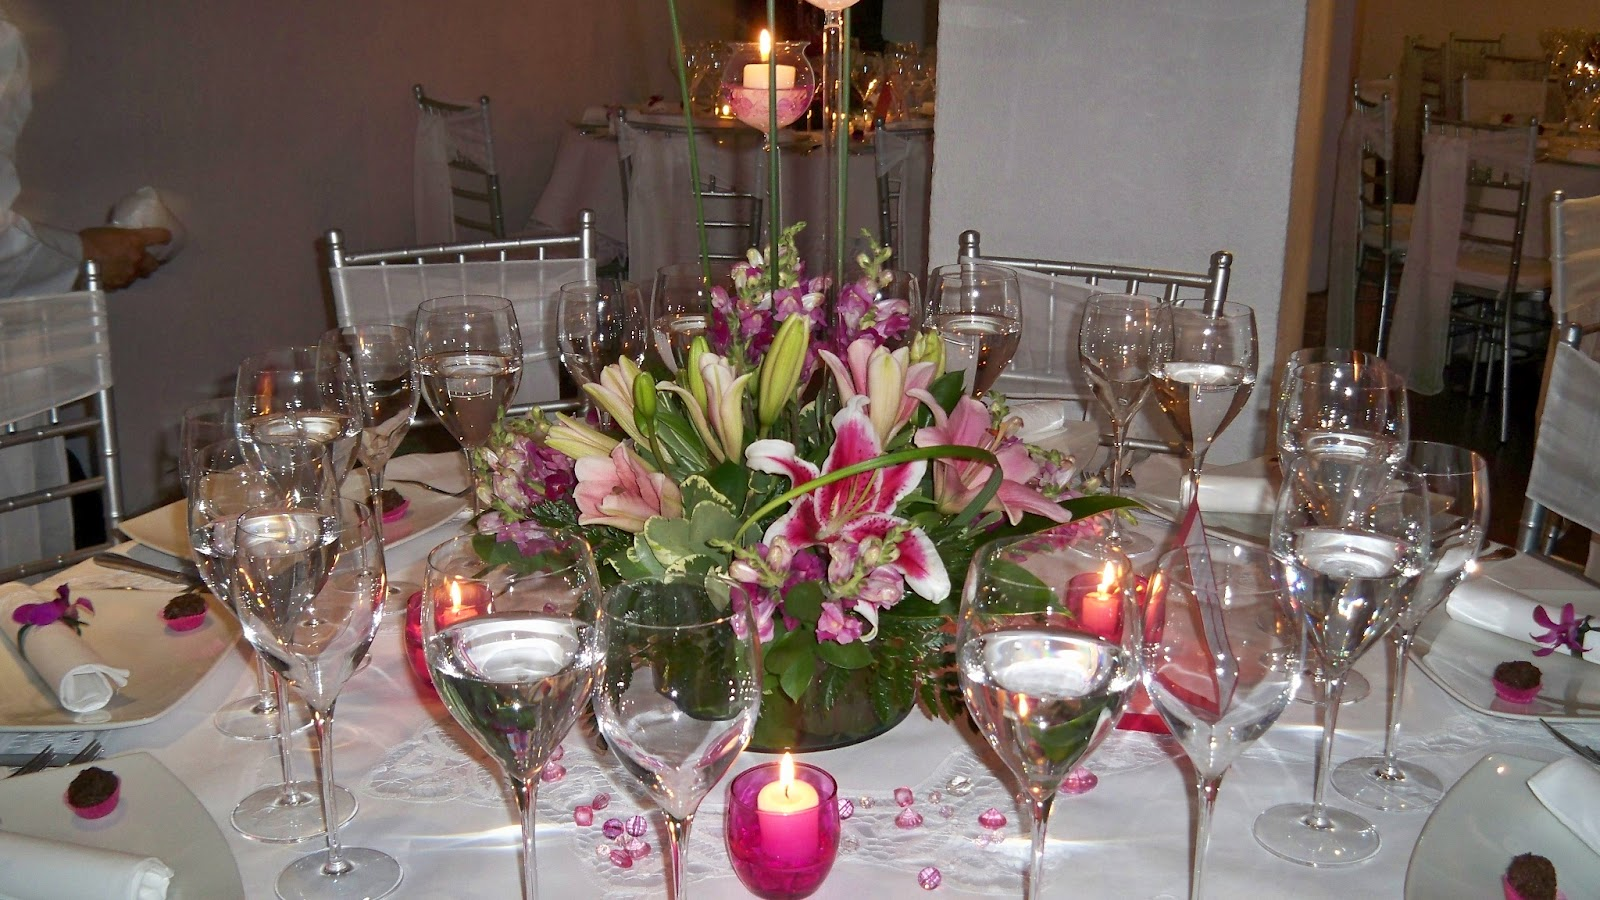 Decoraci n floral aura rosa camacho matrimonio flores - Camacho decoracion ...